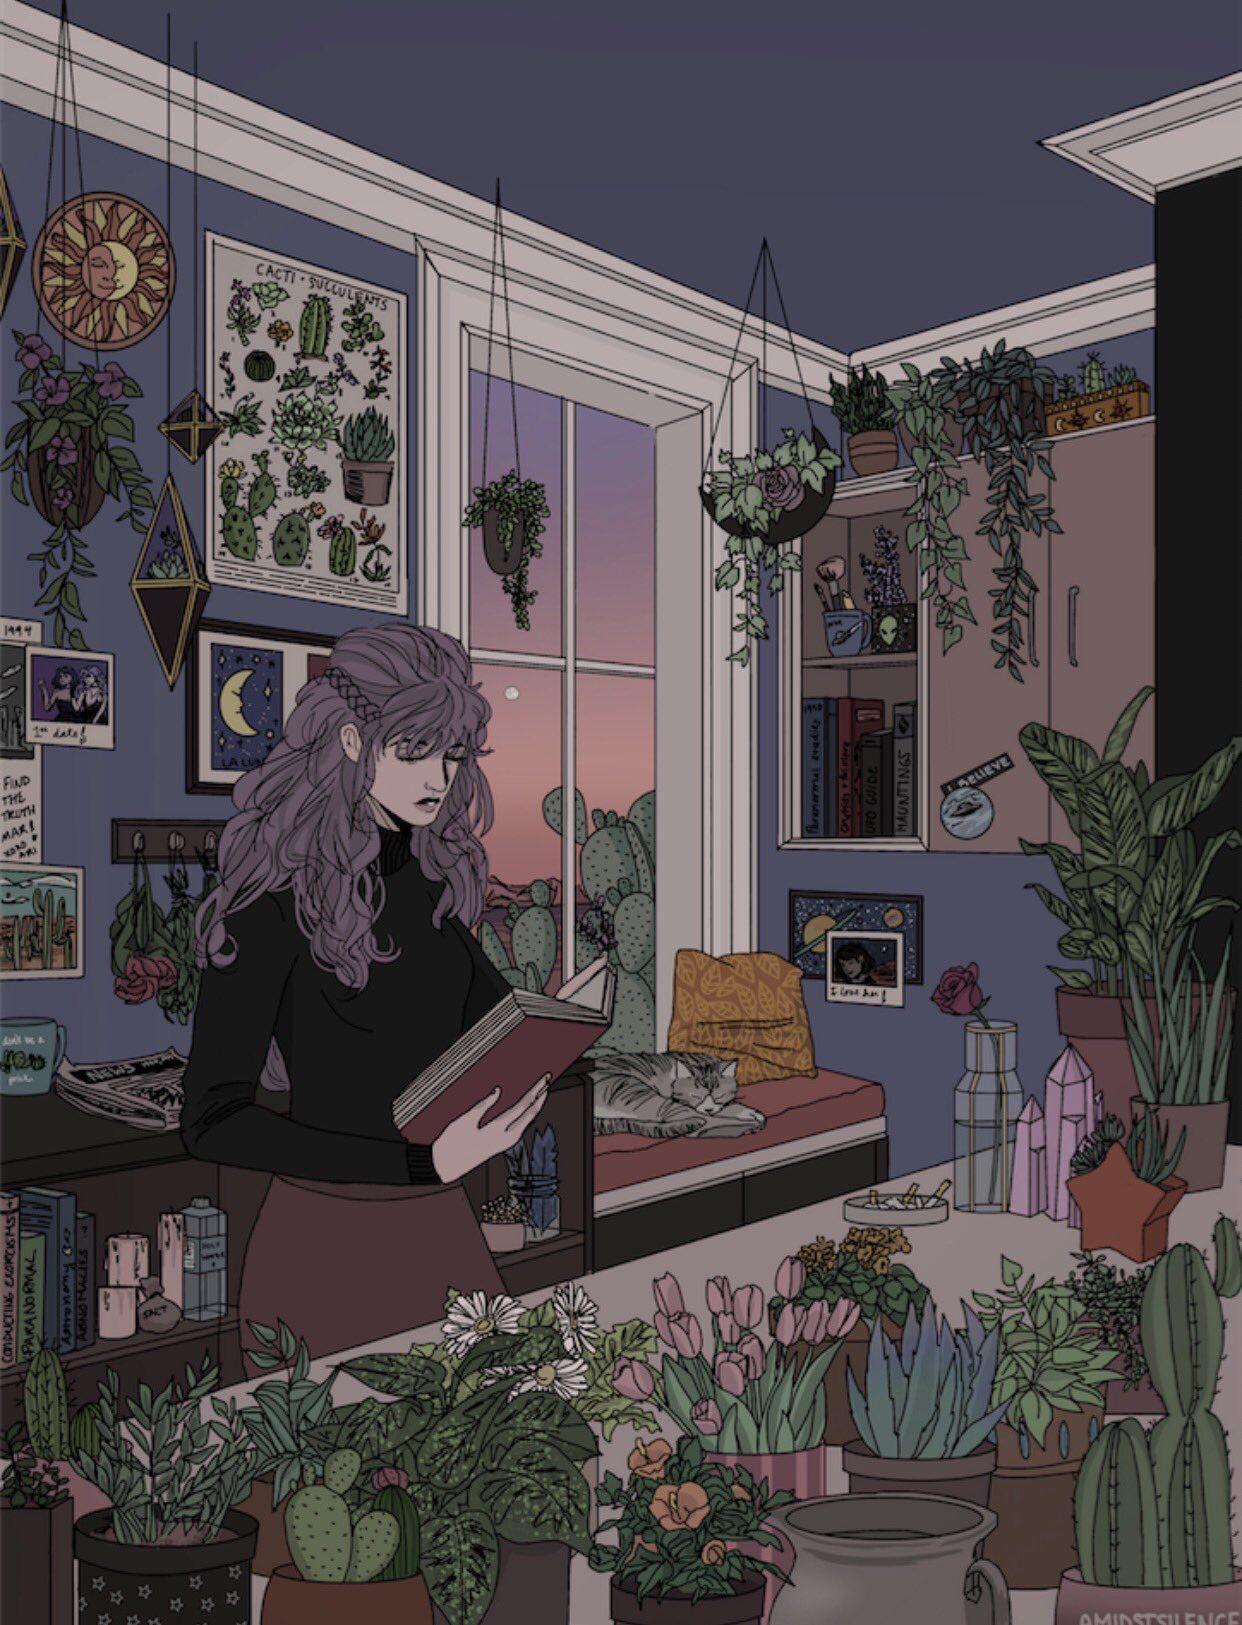 Fantastic Wallpaper Anime Aesthetic - e957166753da214996e1aeeb87d1585d  Snapshot_772274      .jpg